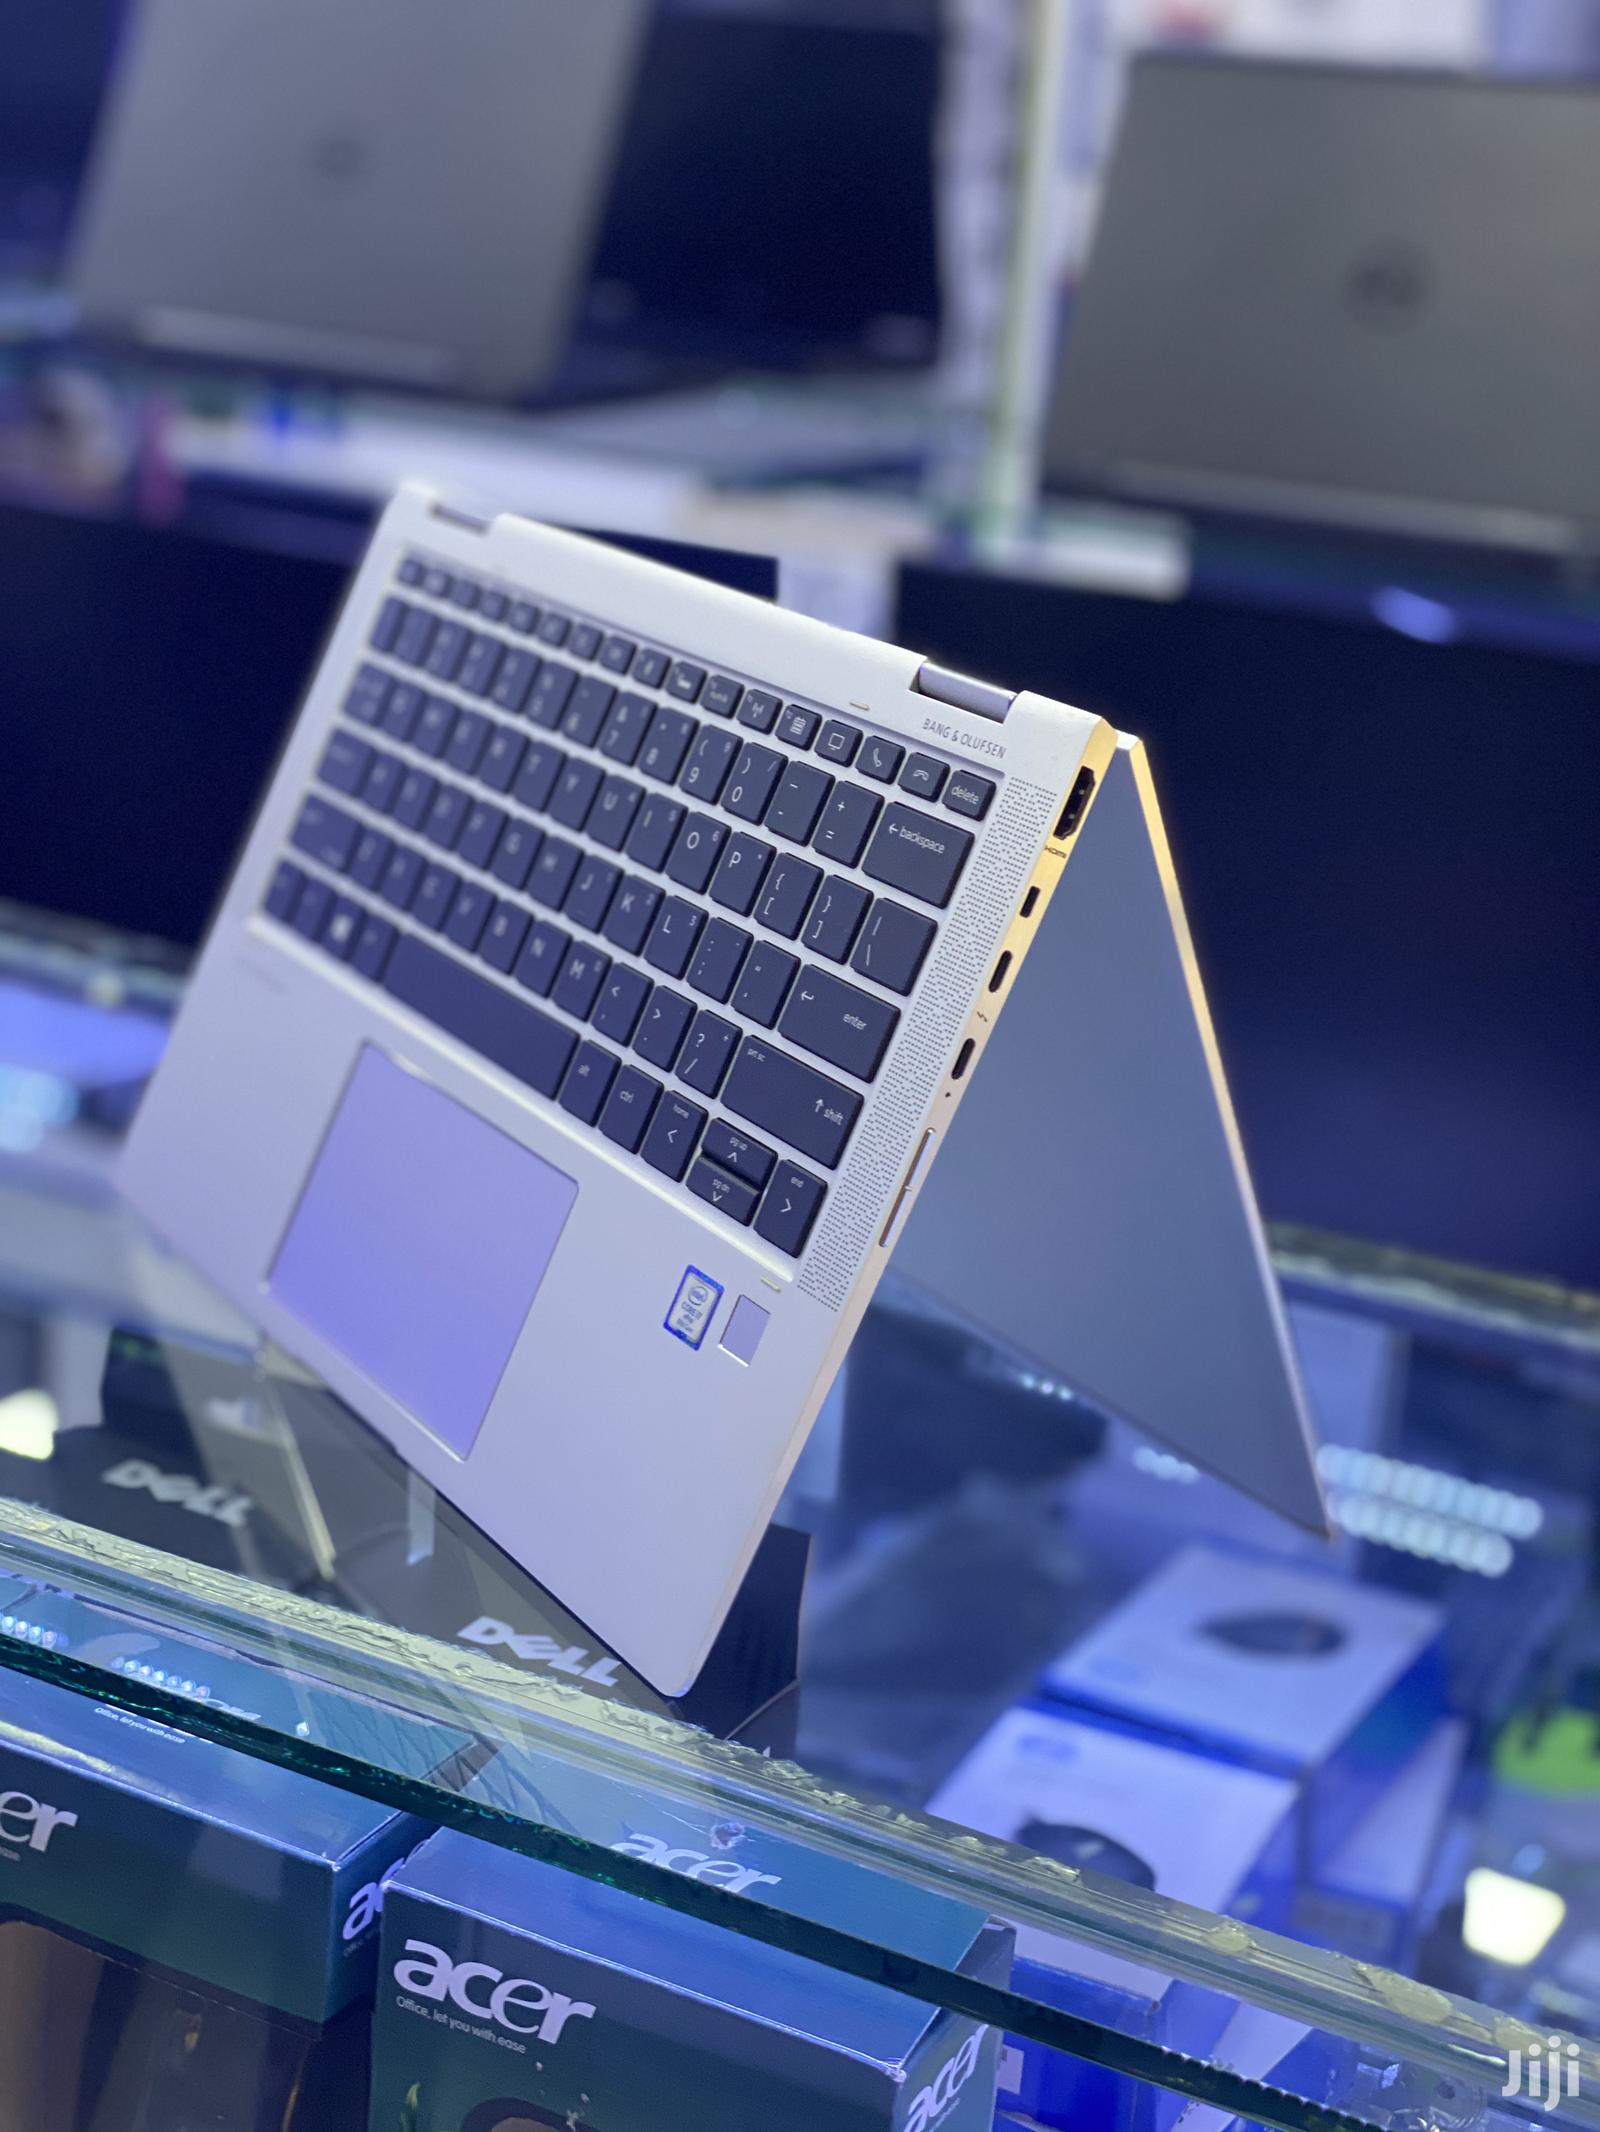 New Laptop Apple MacBook Pro 8GB Intel Core i5 SSHD (Hybrid) 256GB